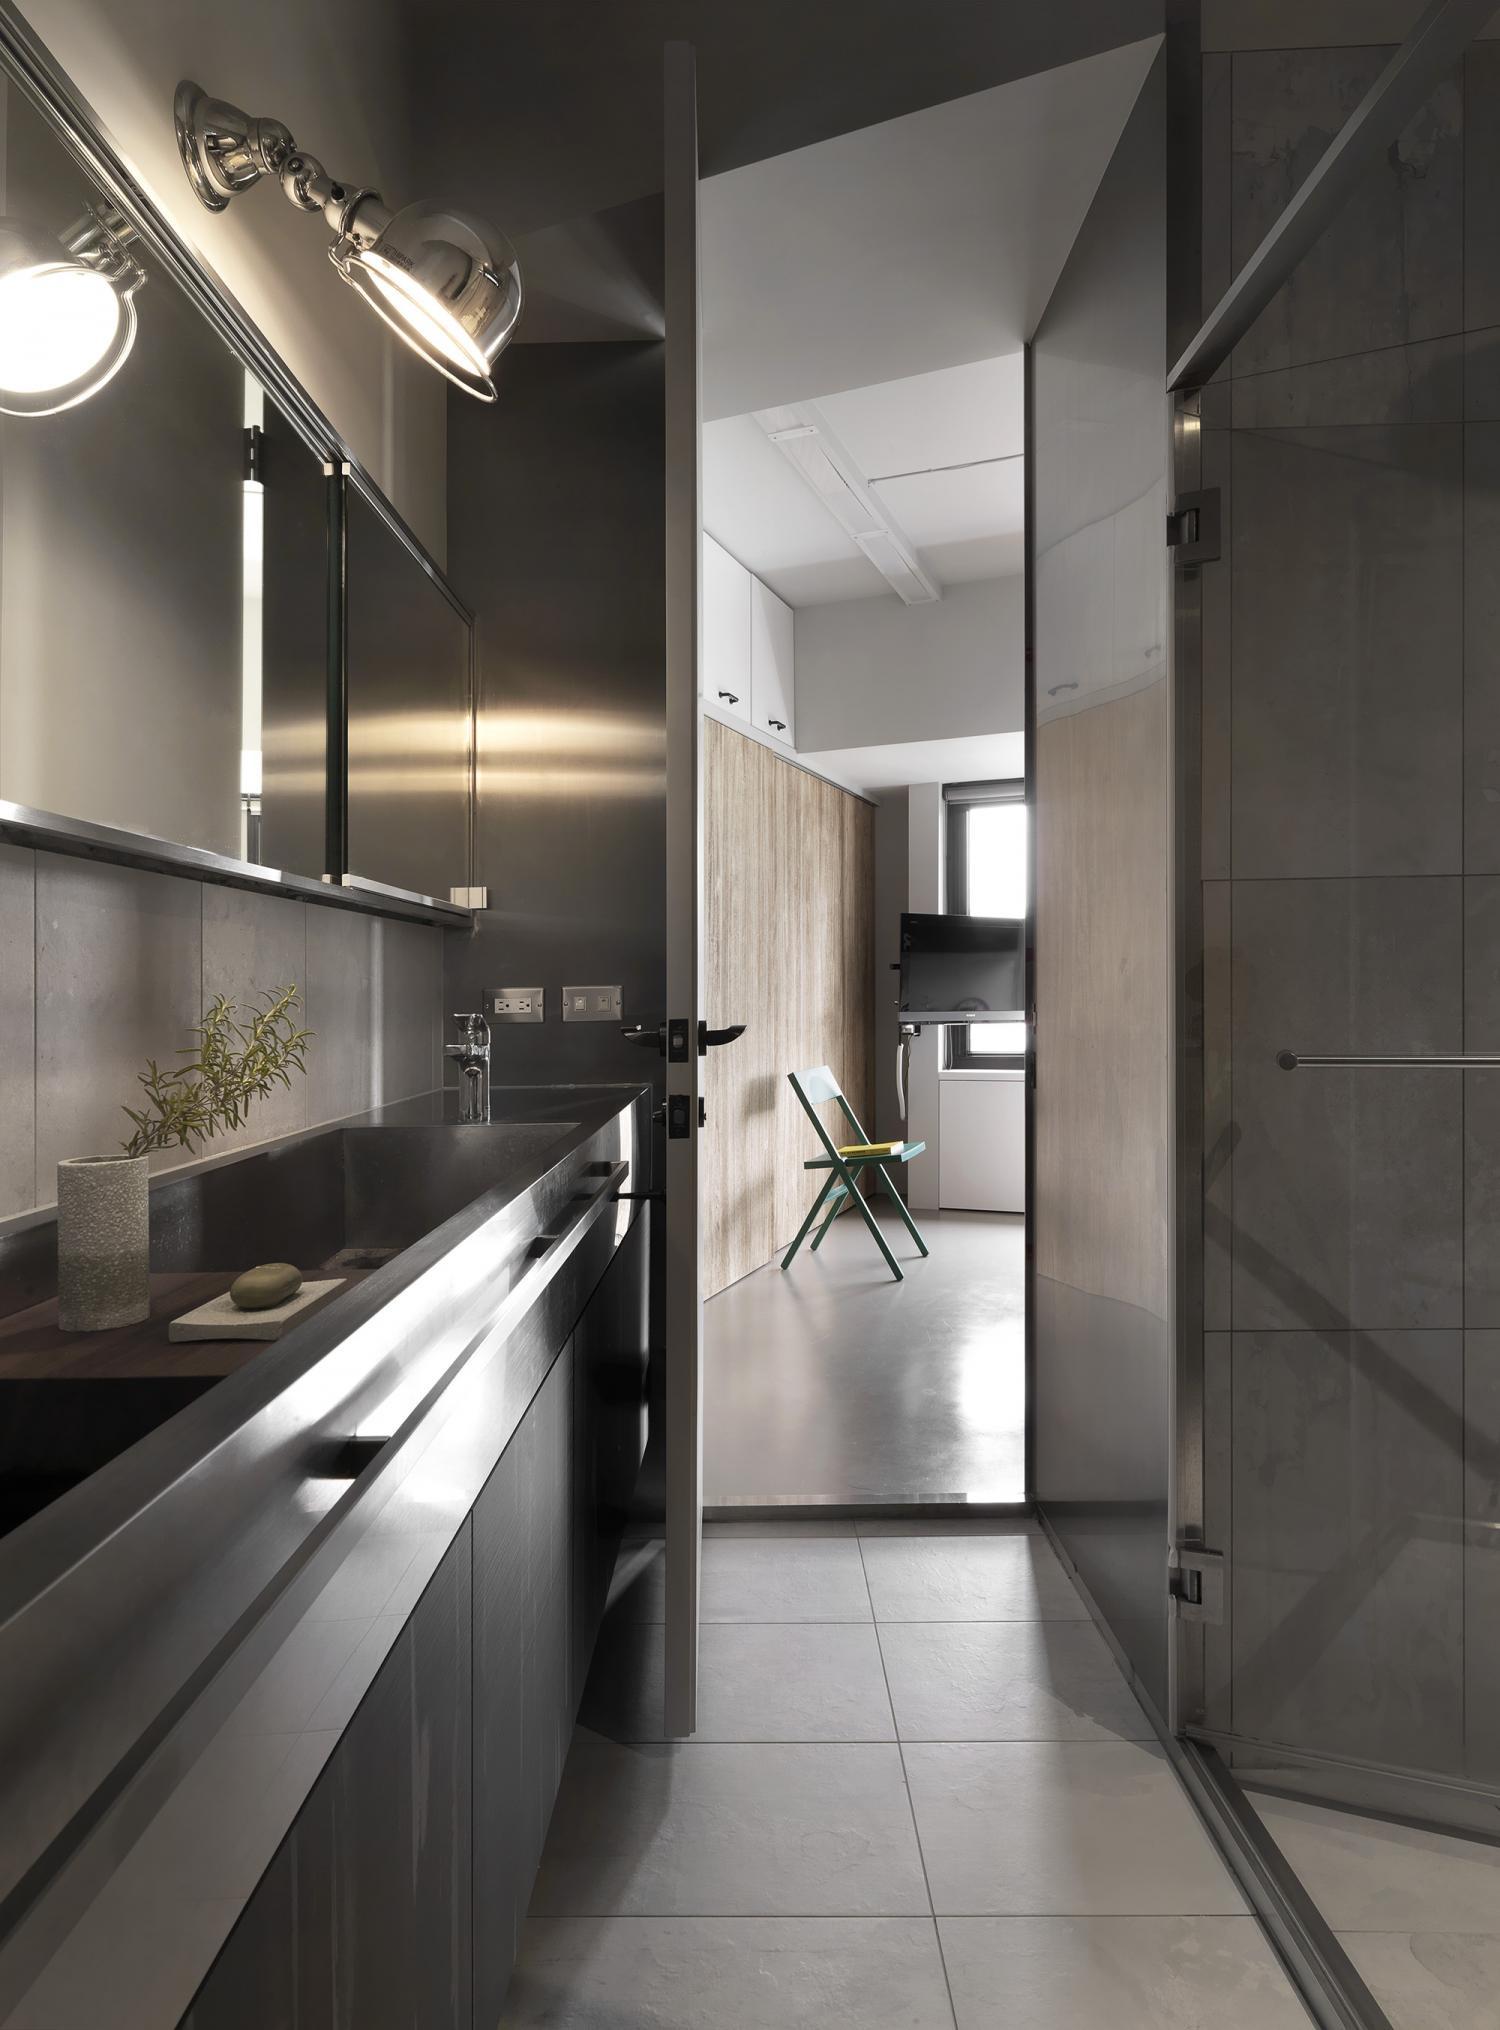 Interior Image 372